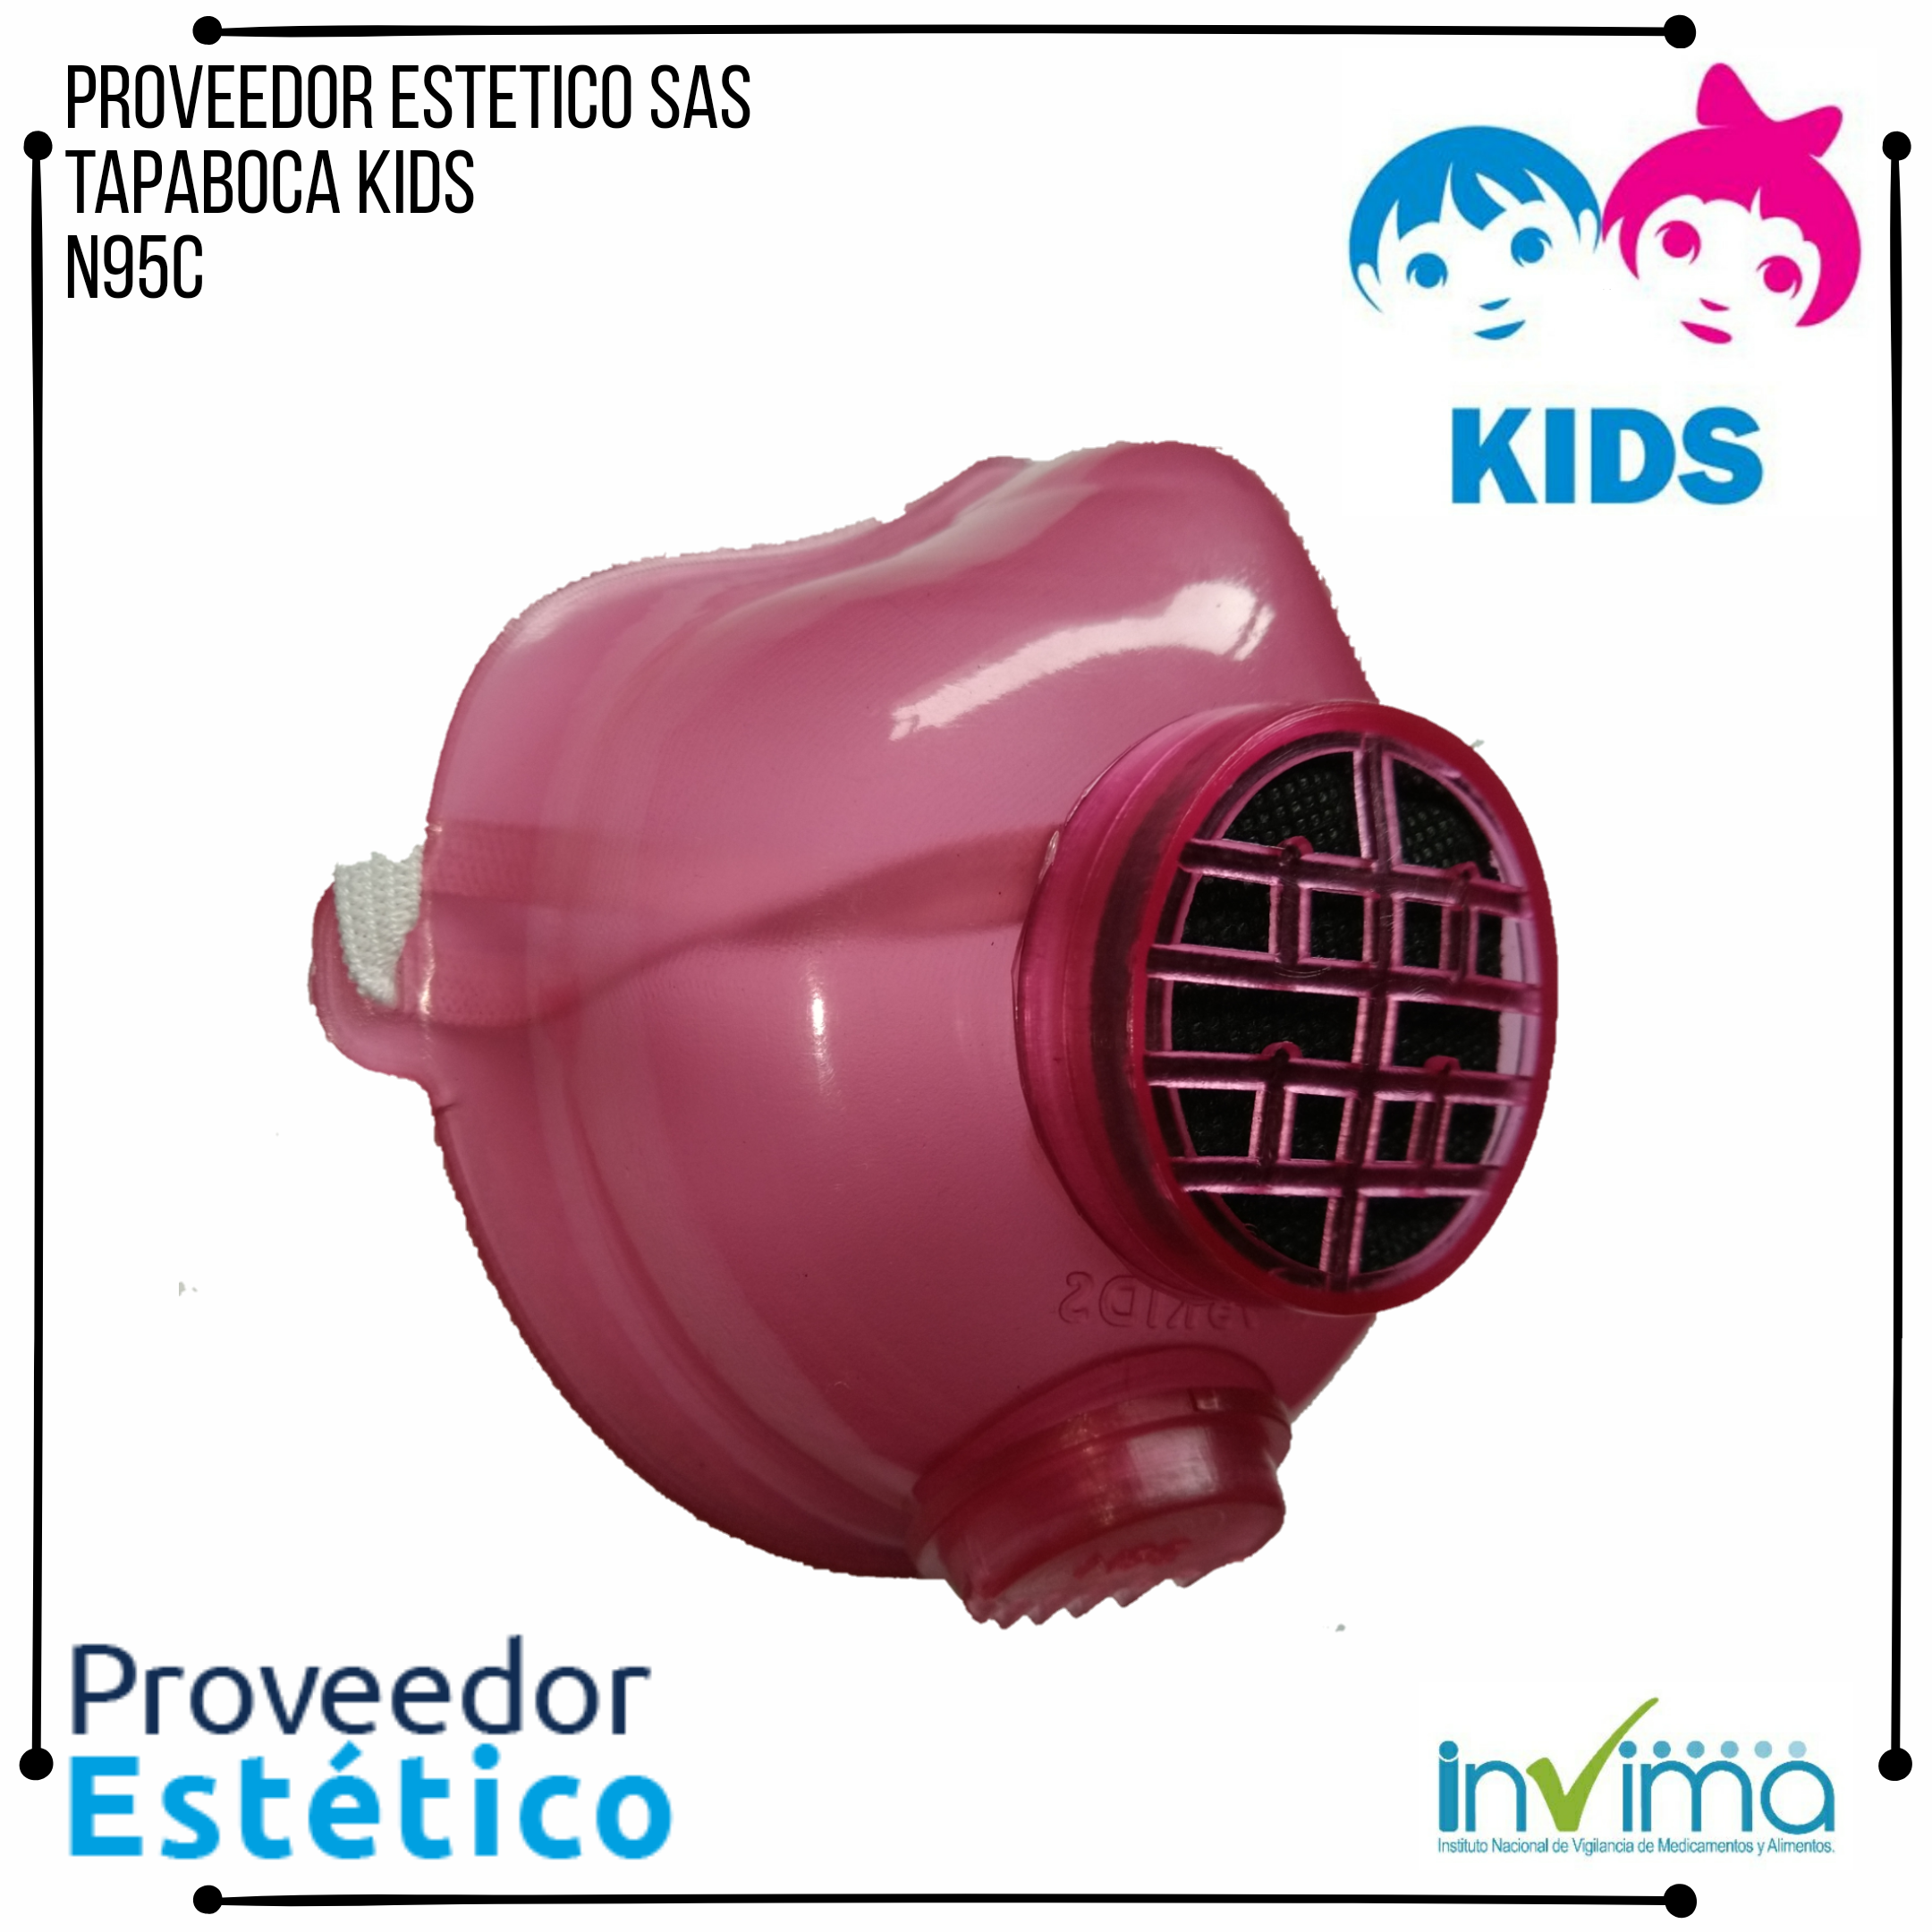 https://0201.nccdn.net/1_2/000/000/18e/785/Tapaboca-N95-Kids_2.png